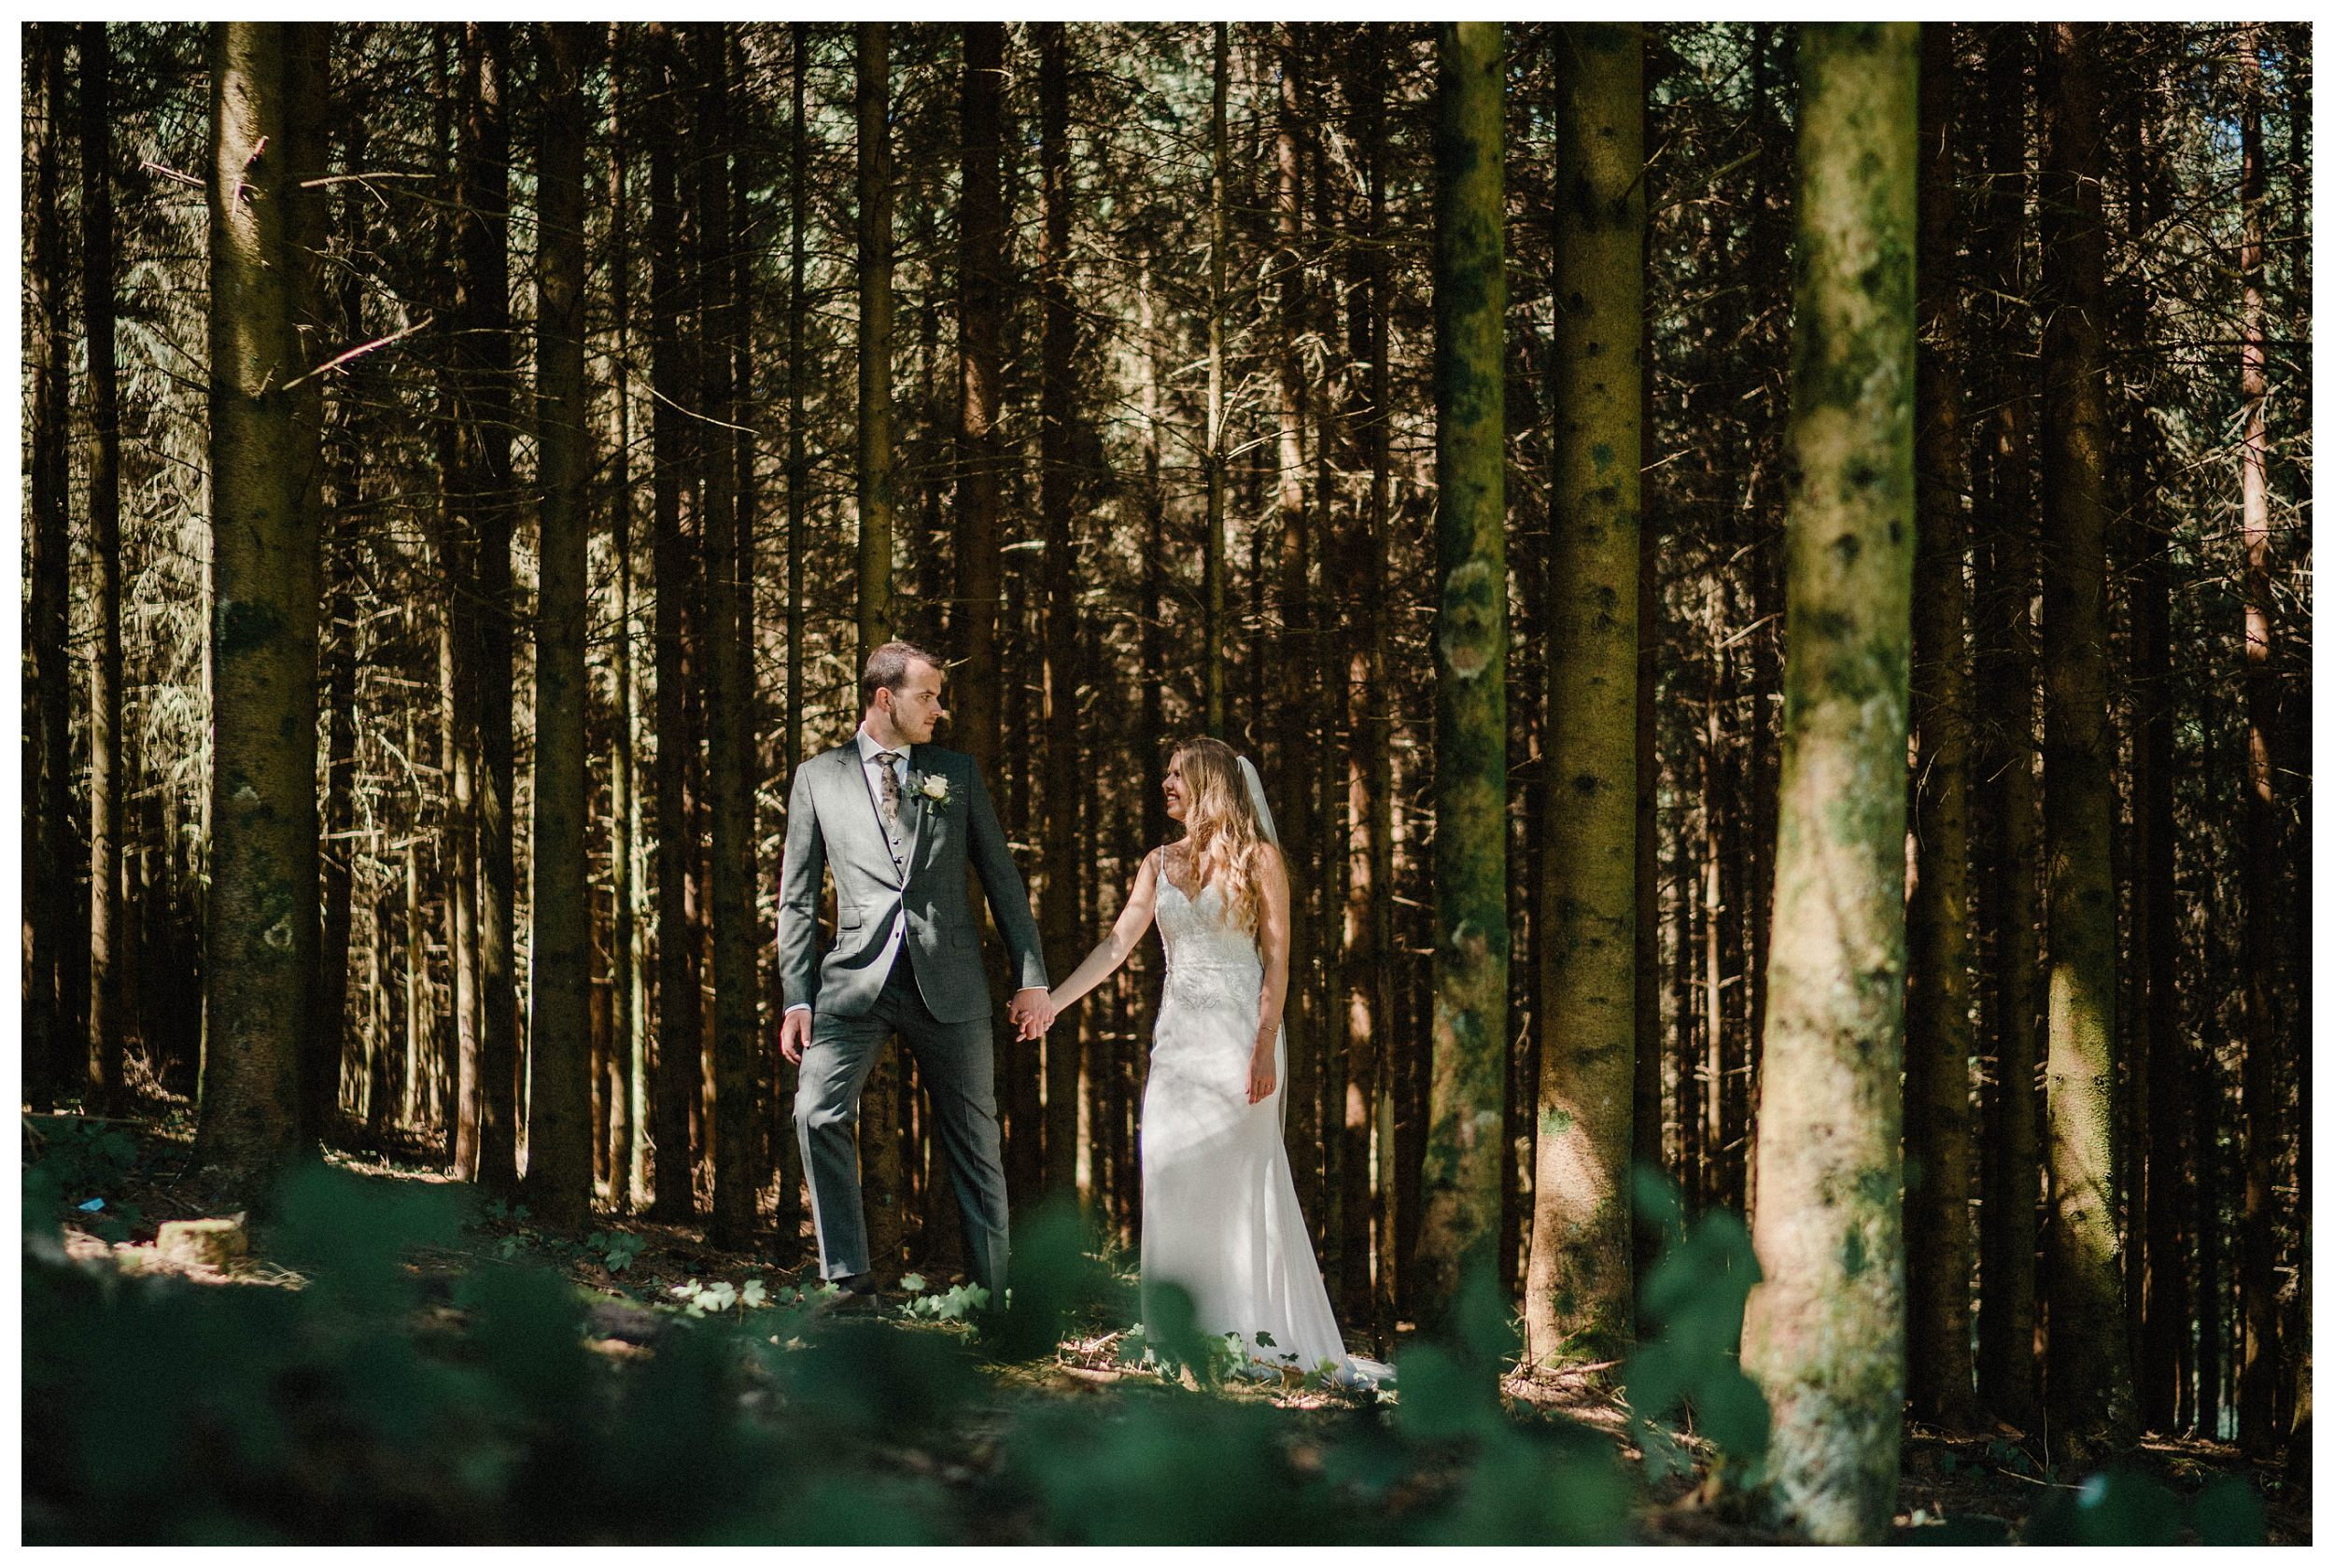 huwelijksfotograaf bruidsfotograaf destinationwedding huwelijksfotografie in ardennen nederland (48).jpg